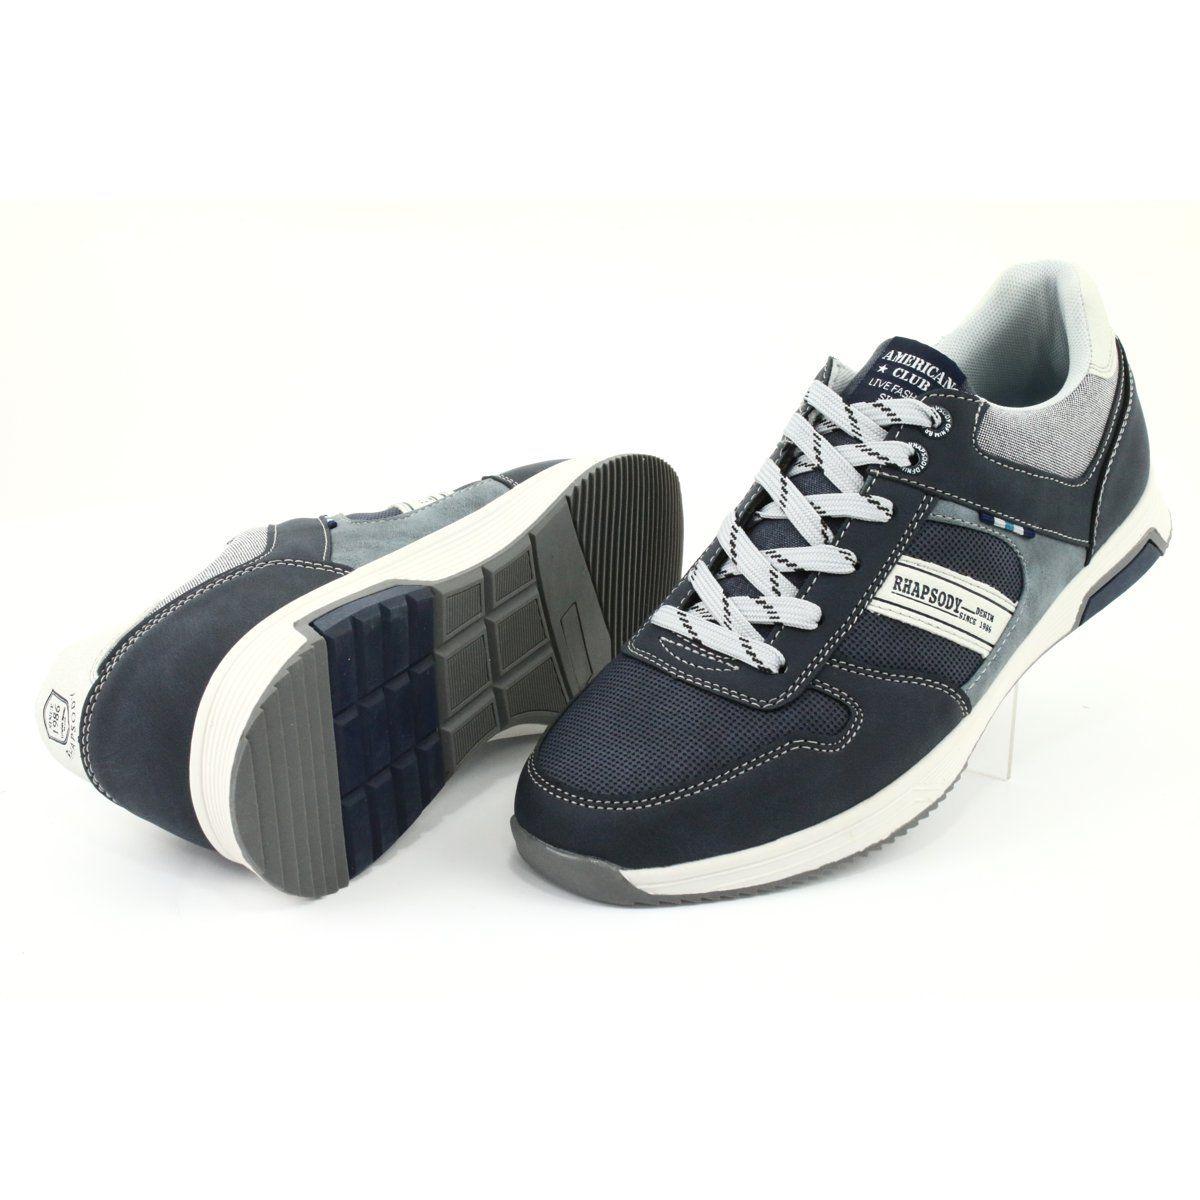 Adi Buty Meskie Sportowe American Club Rh01 Granatowe Niebieskie Szare Adidas Samba Adidas Samba Sneakers Shoes